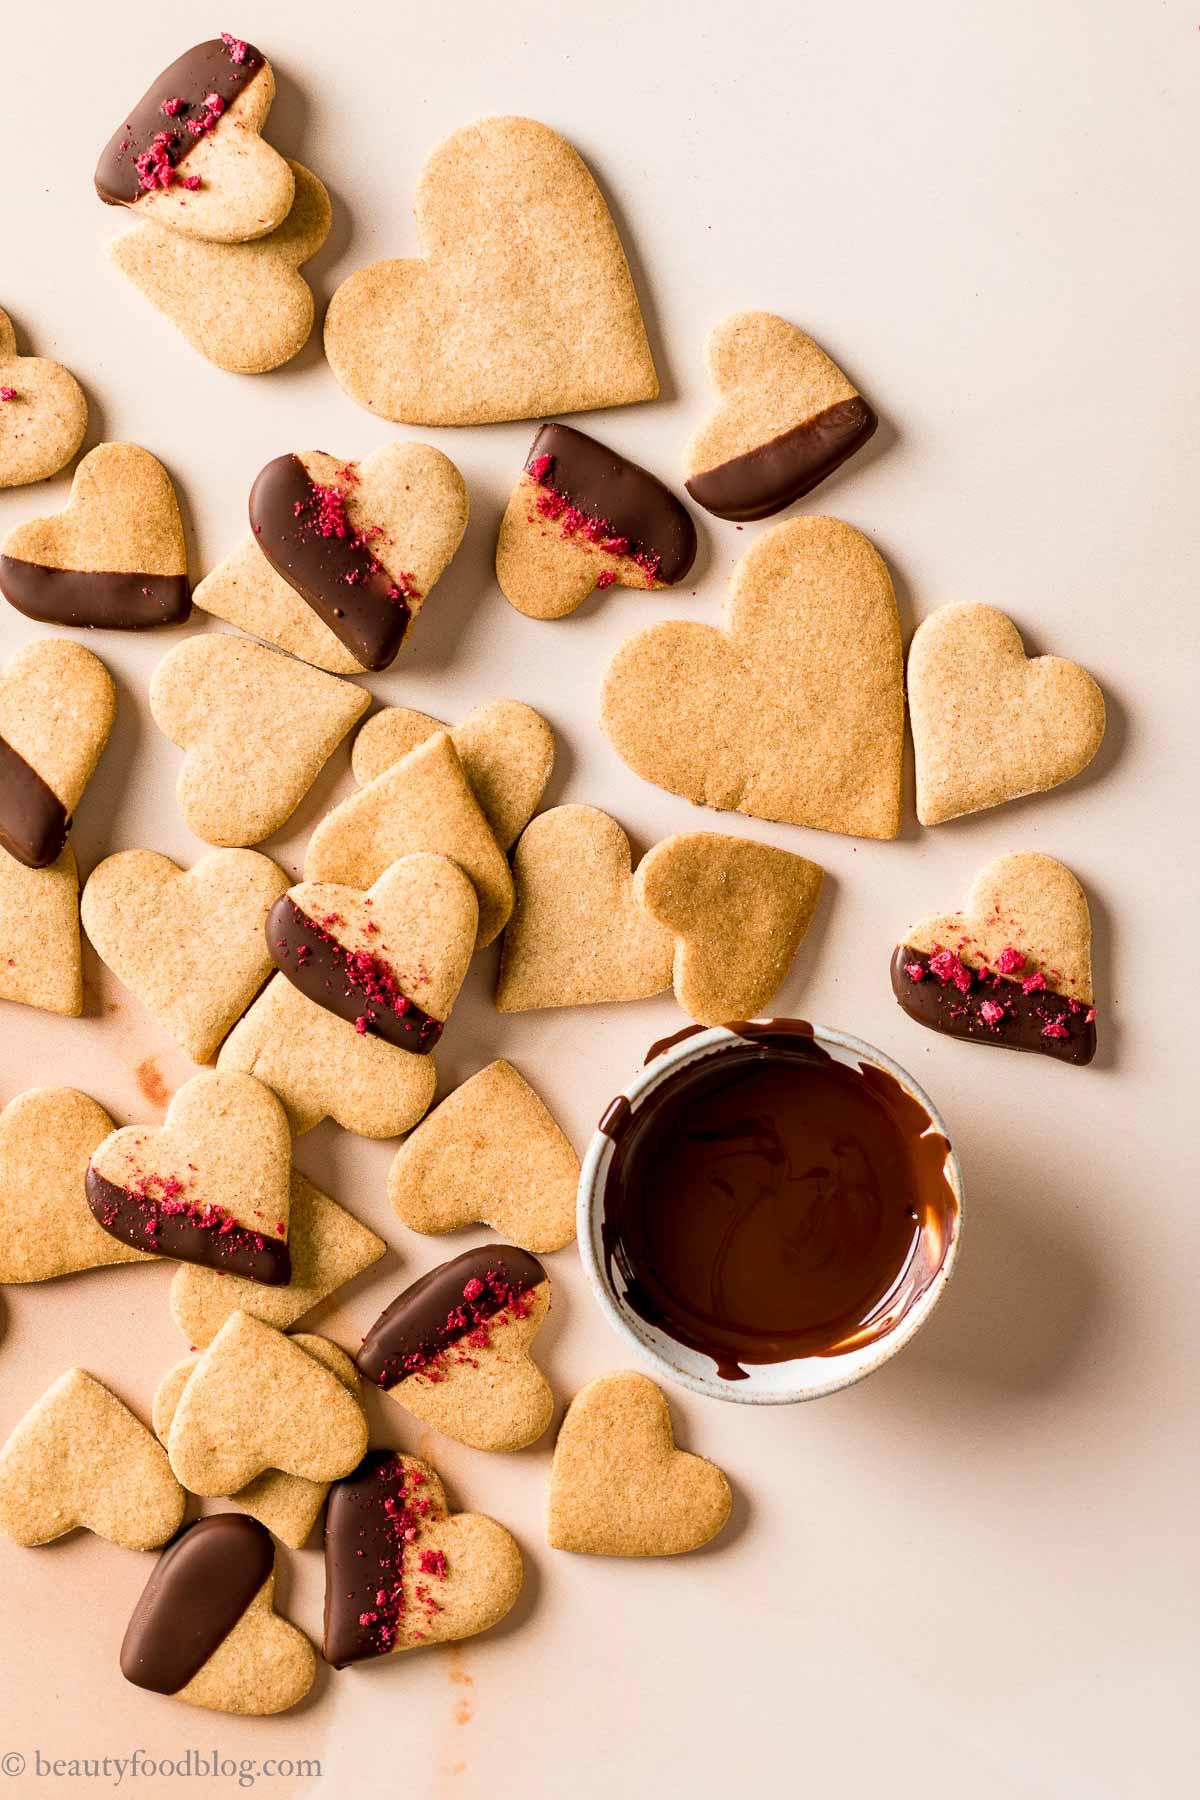 ricetta biscotti di pasta frolla vegana integrale senza uova senza burro per San Valentino frollini vegan Valentines Day vegan shortbread cookies